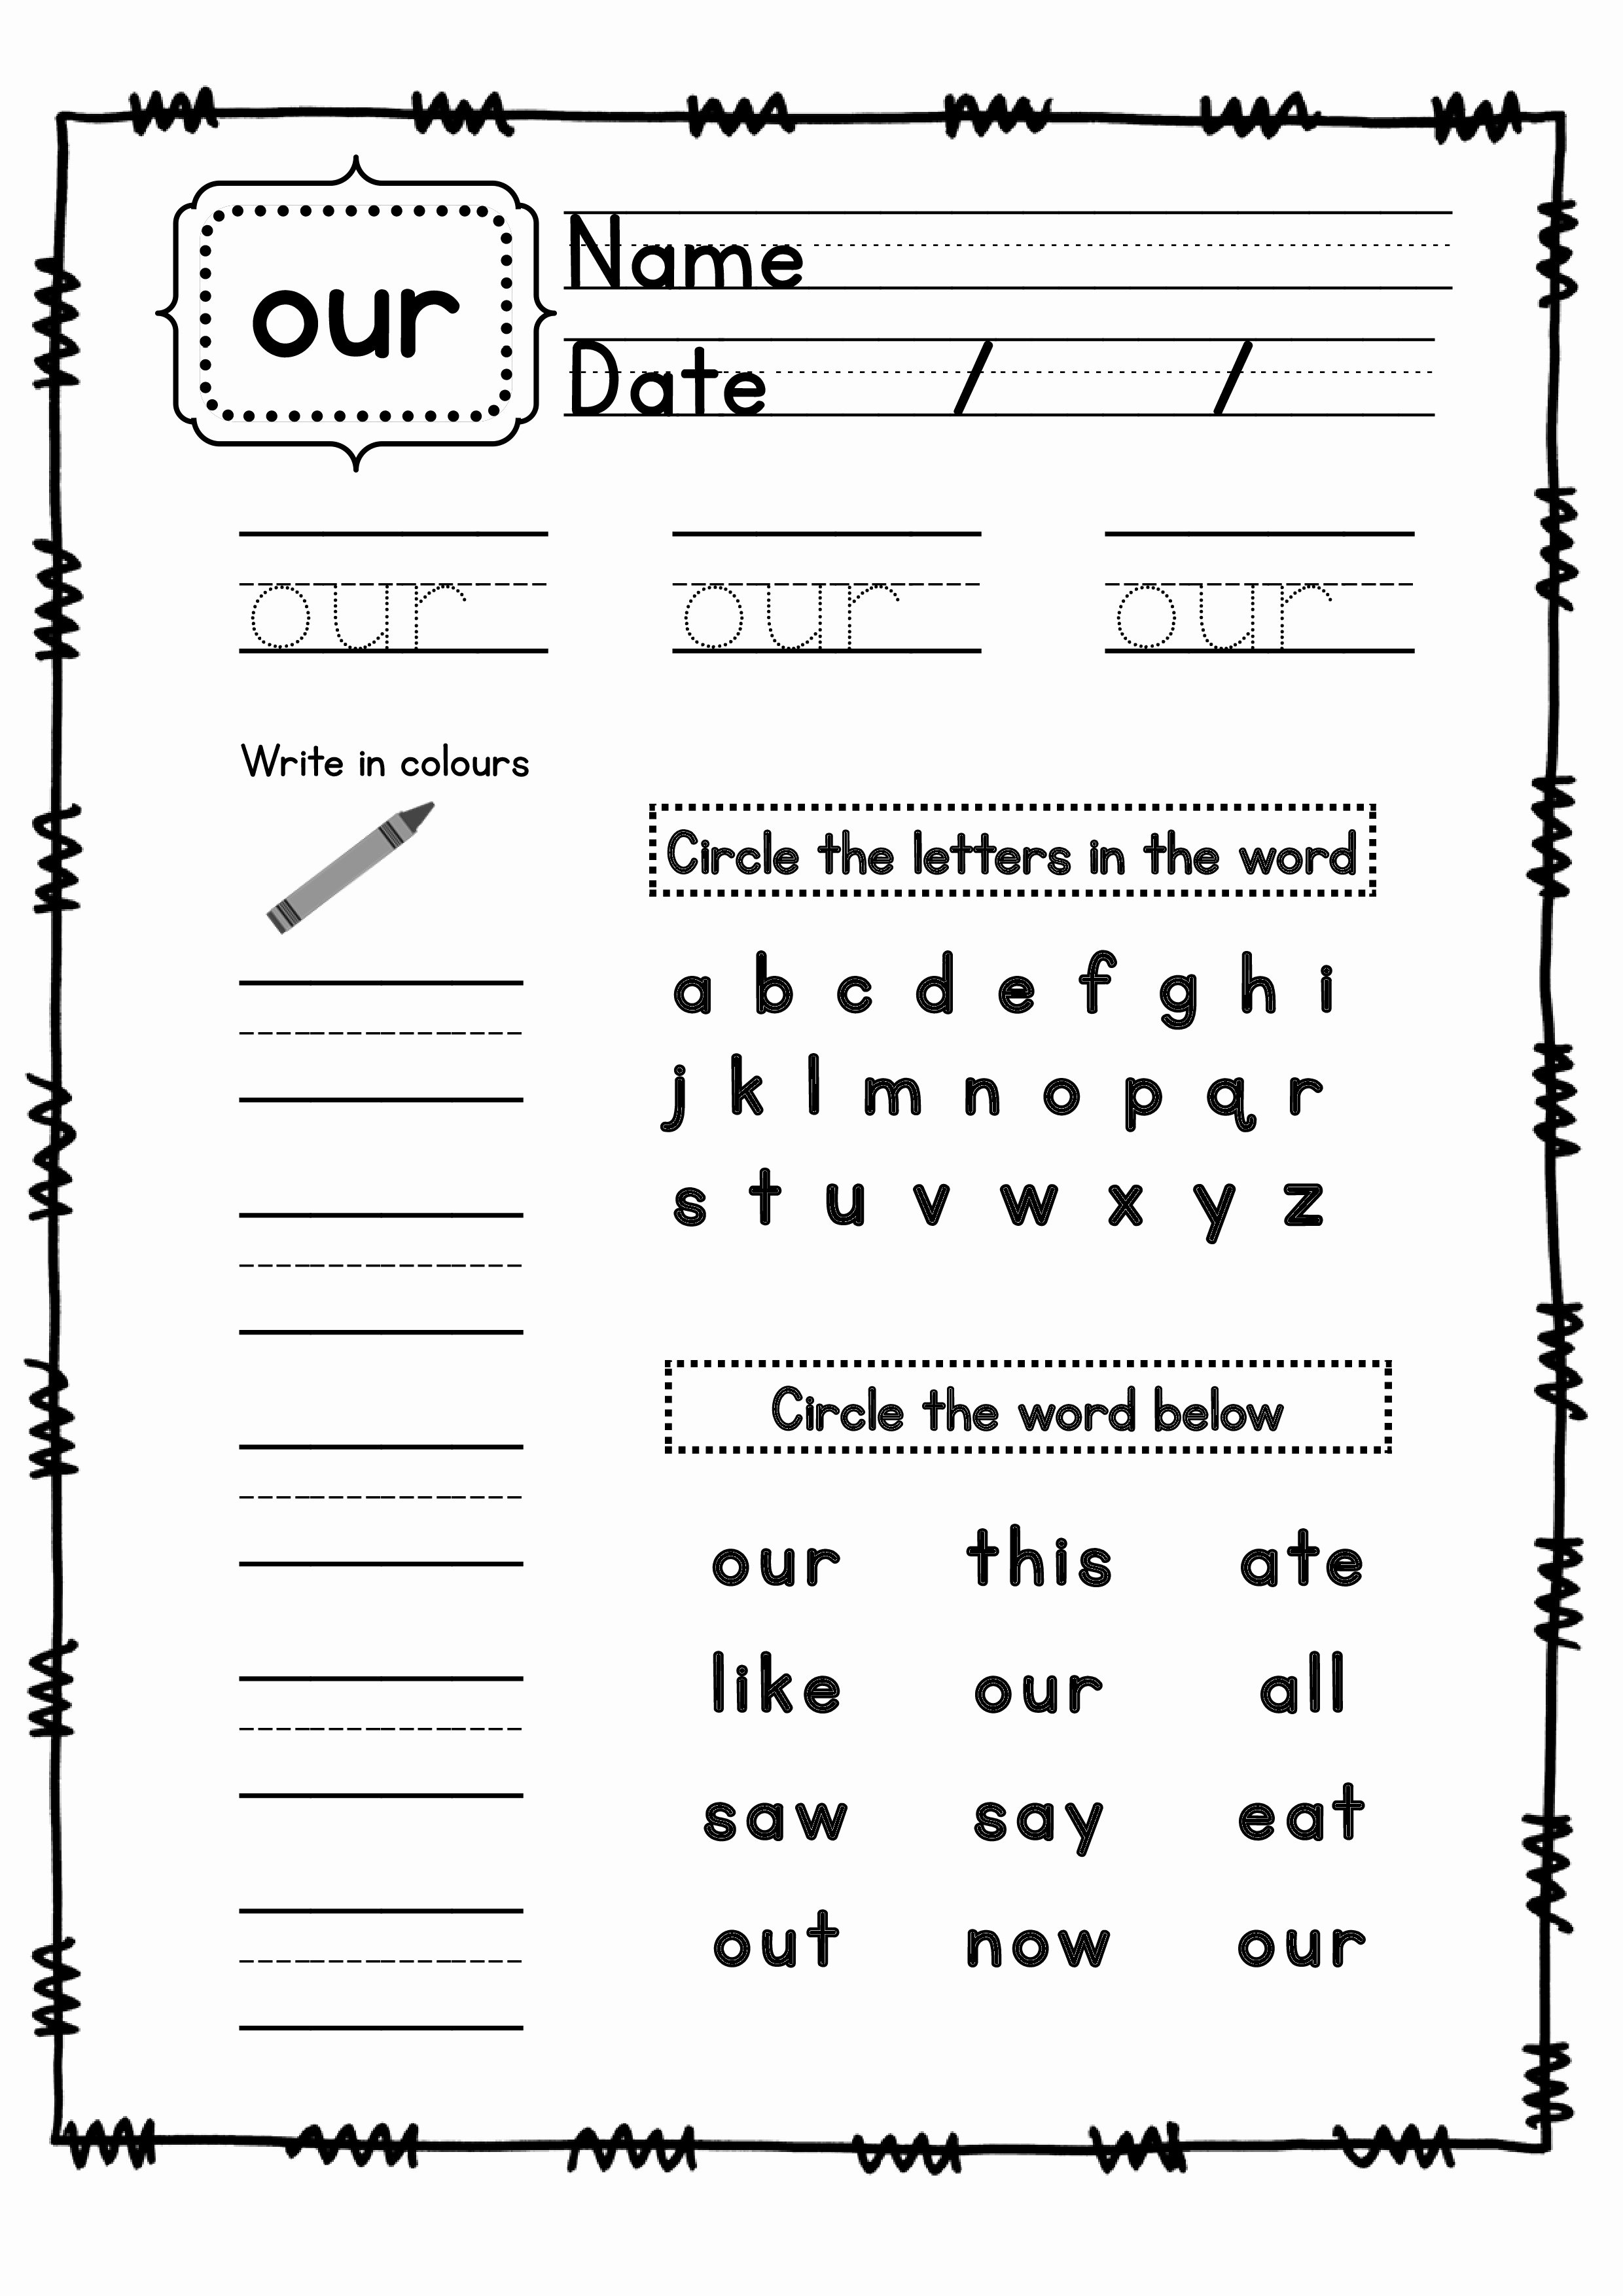 Sight Word Like Worksheet Luxury Primer Sight Word Worksheets